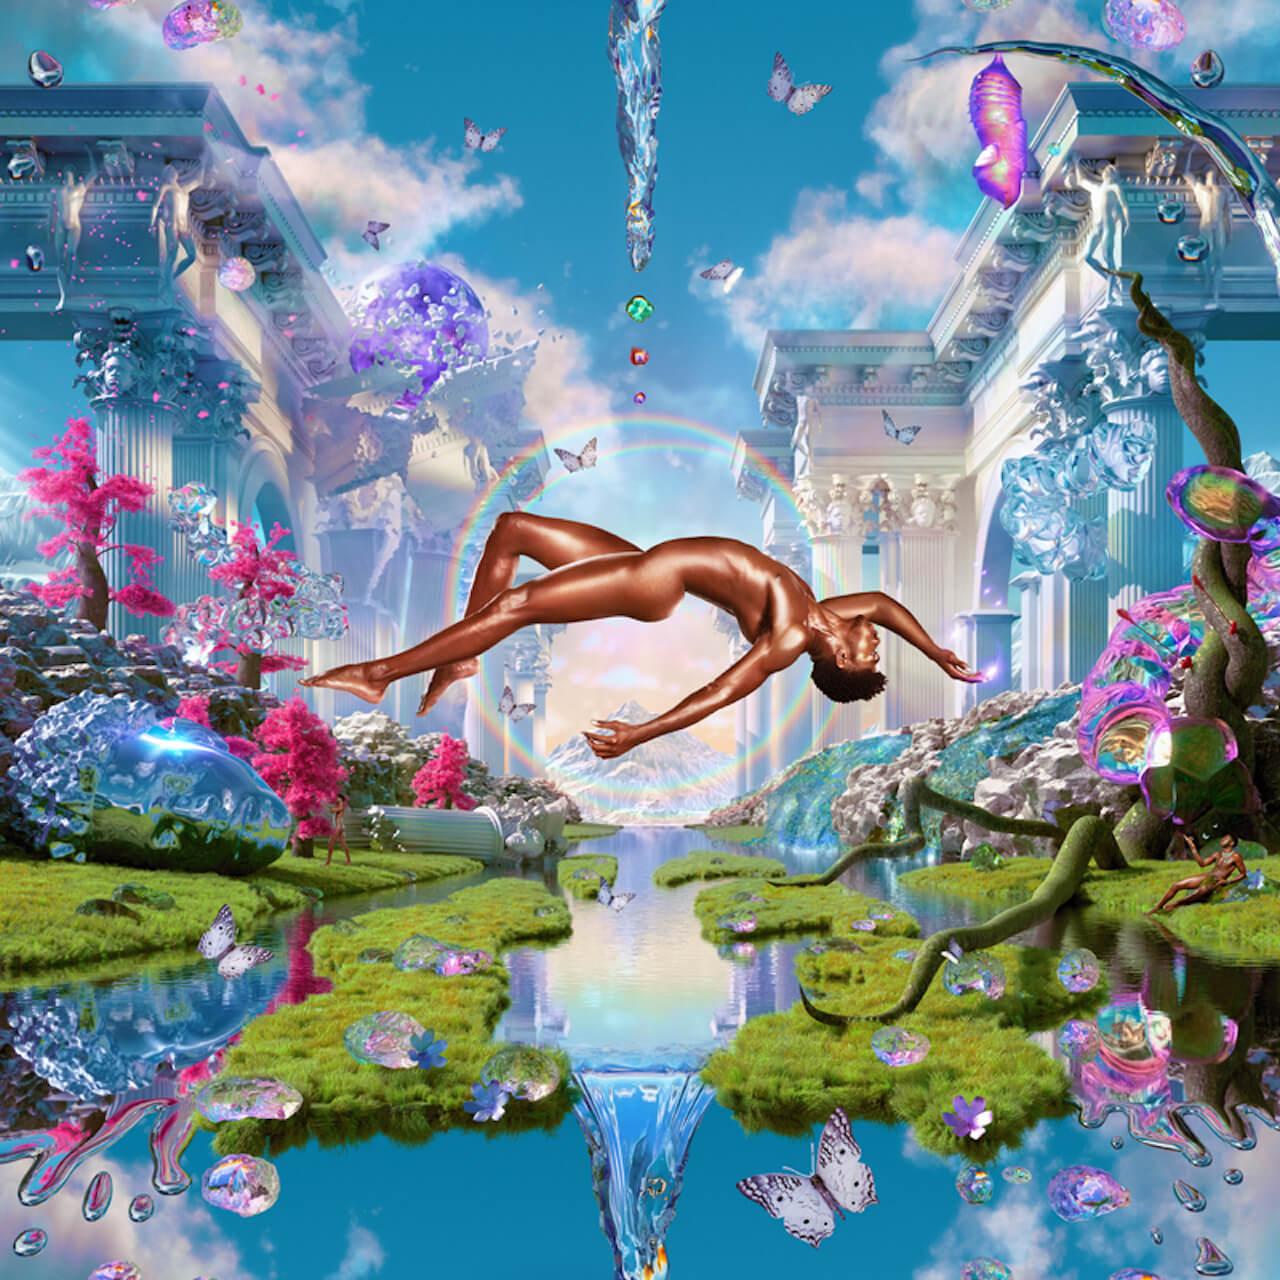 <METガラ2021>でも話題のLil Nas X、1stアルバム『MONTERO』をリリース music210917-lil-nas-x-2